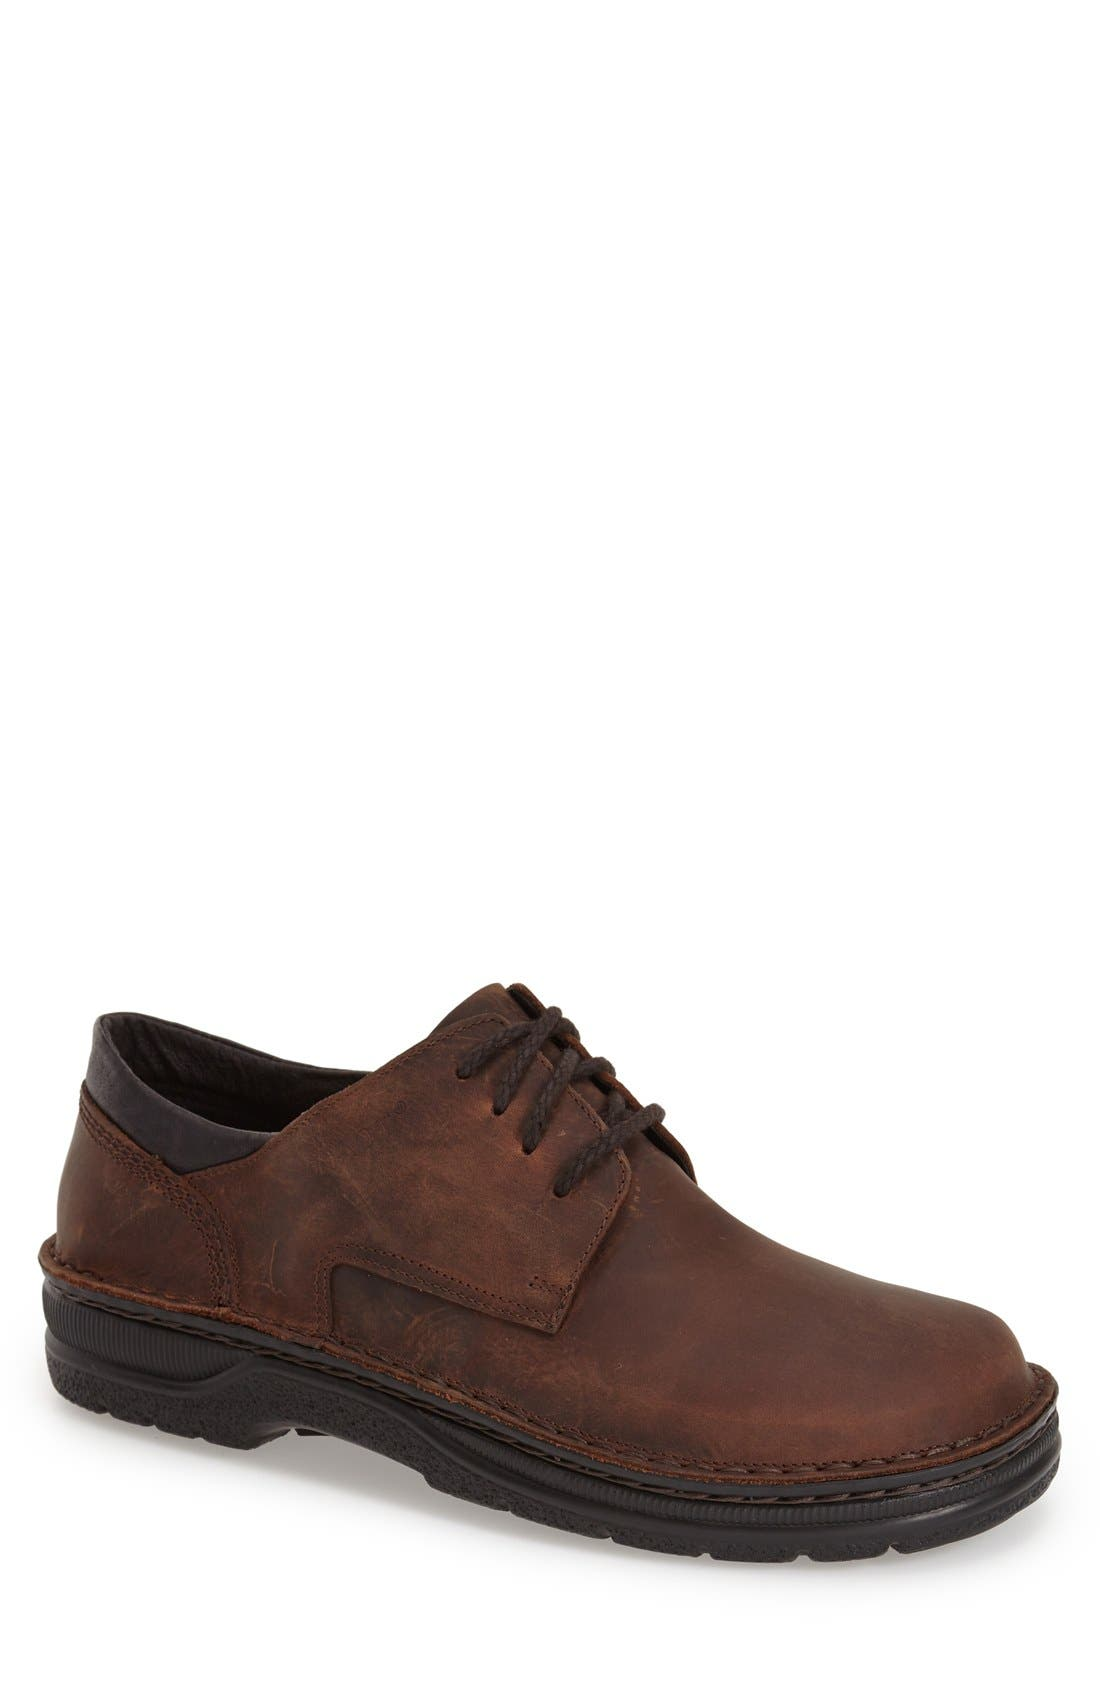 Alternate Image 1 Selected - Naot Denali Plain Toe Derby (Men)